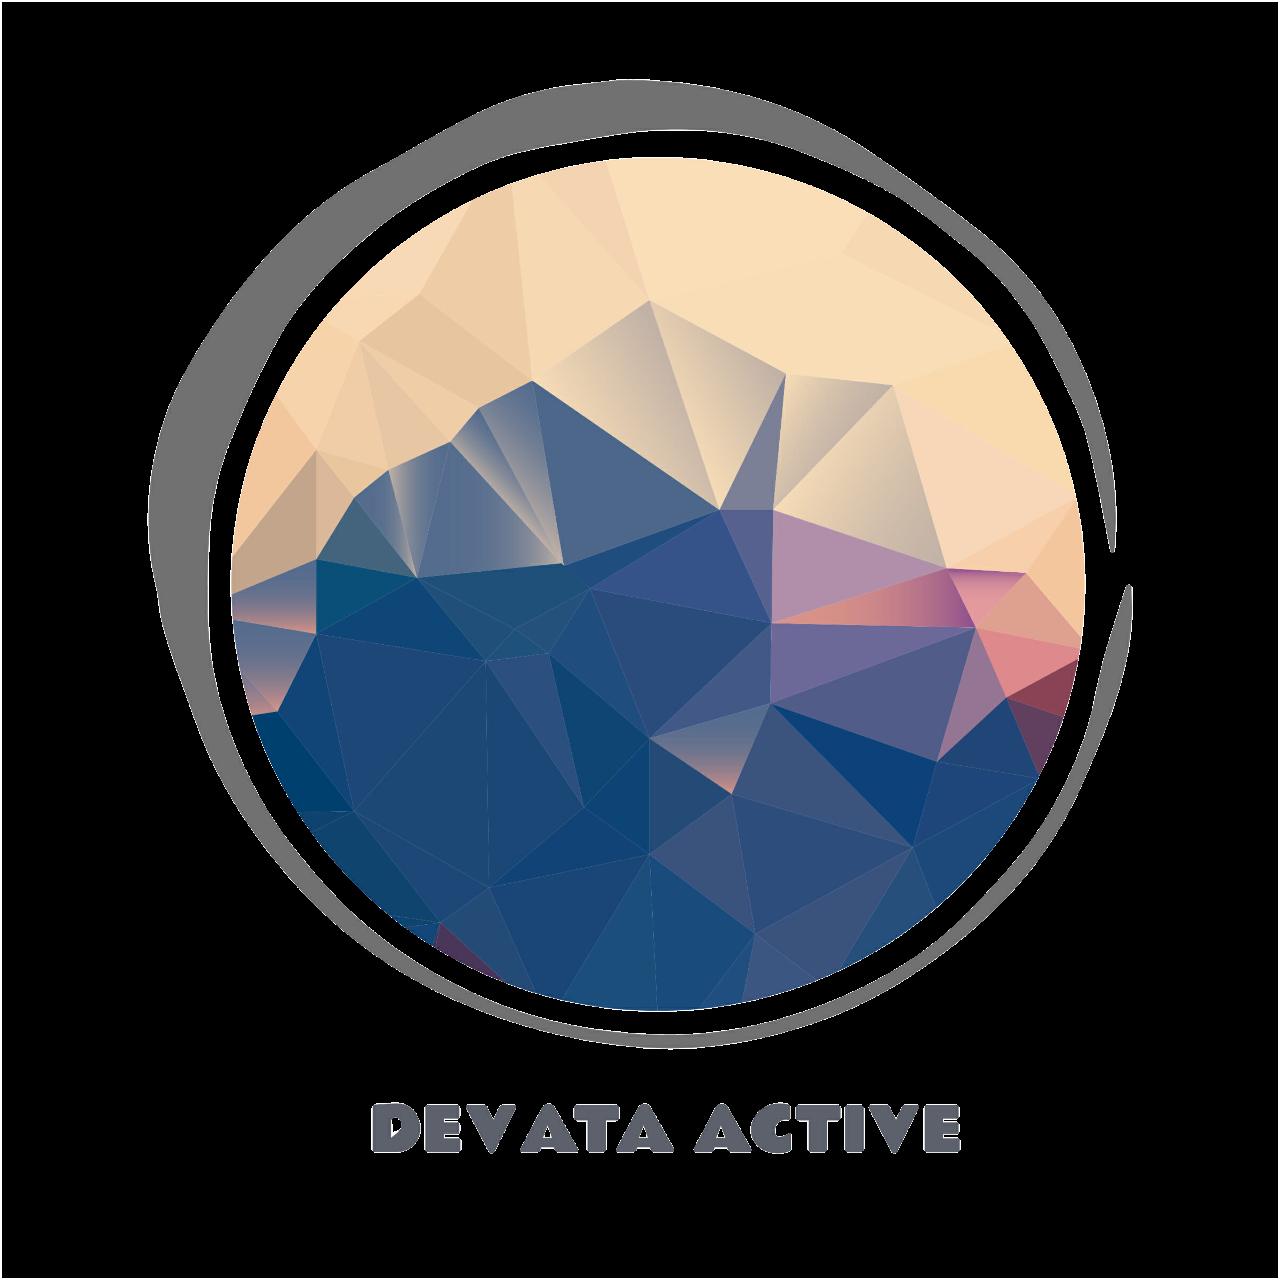 DEVATE Active